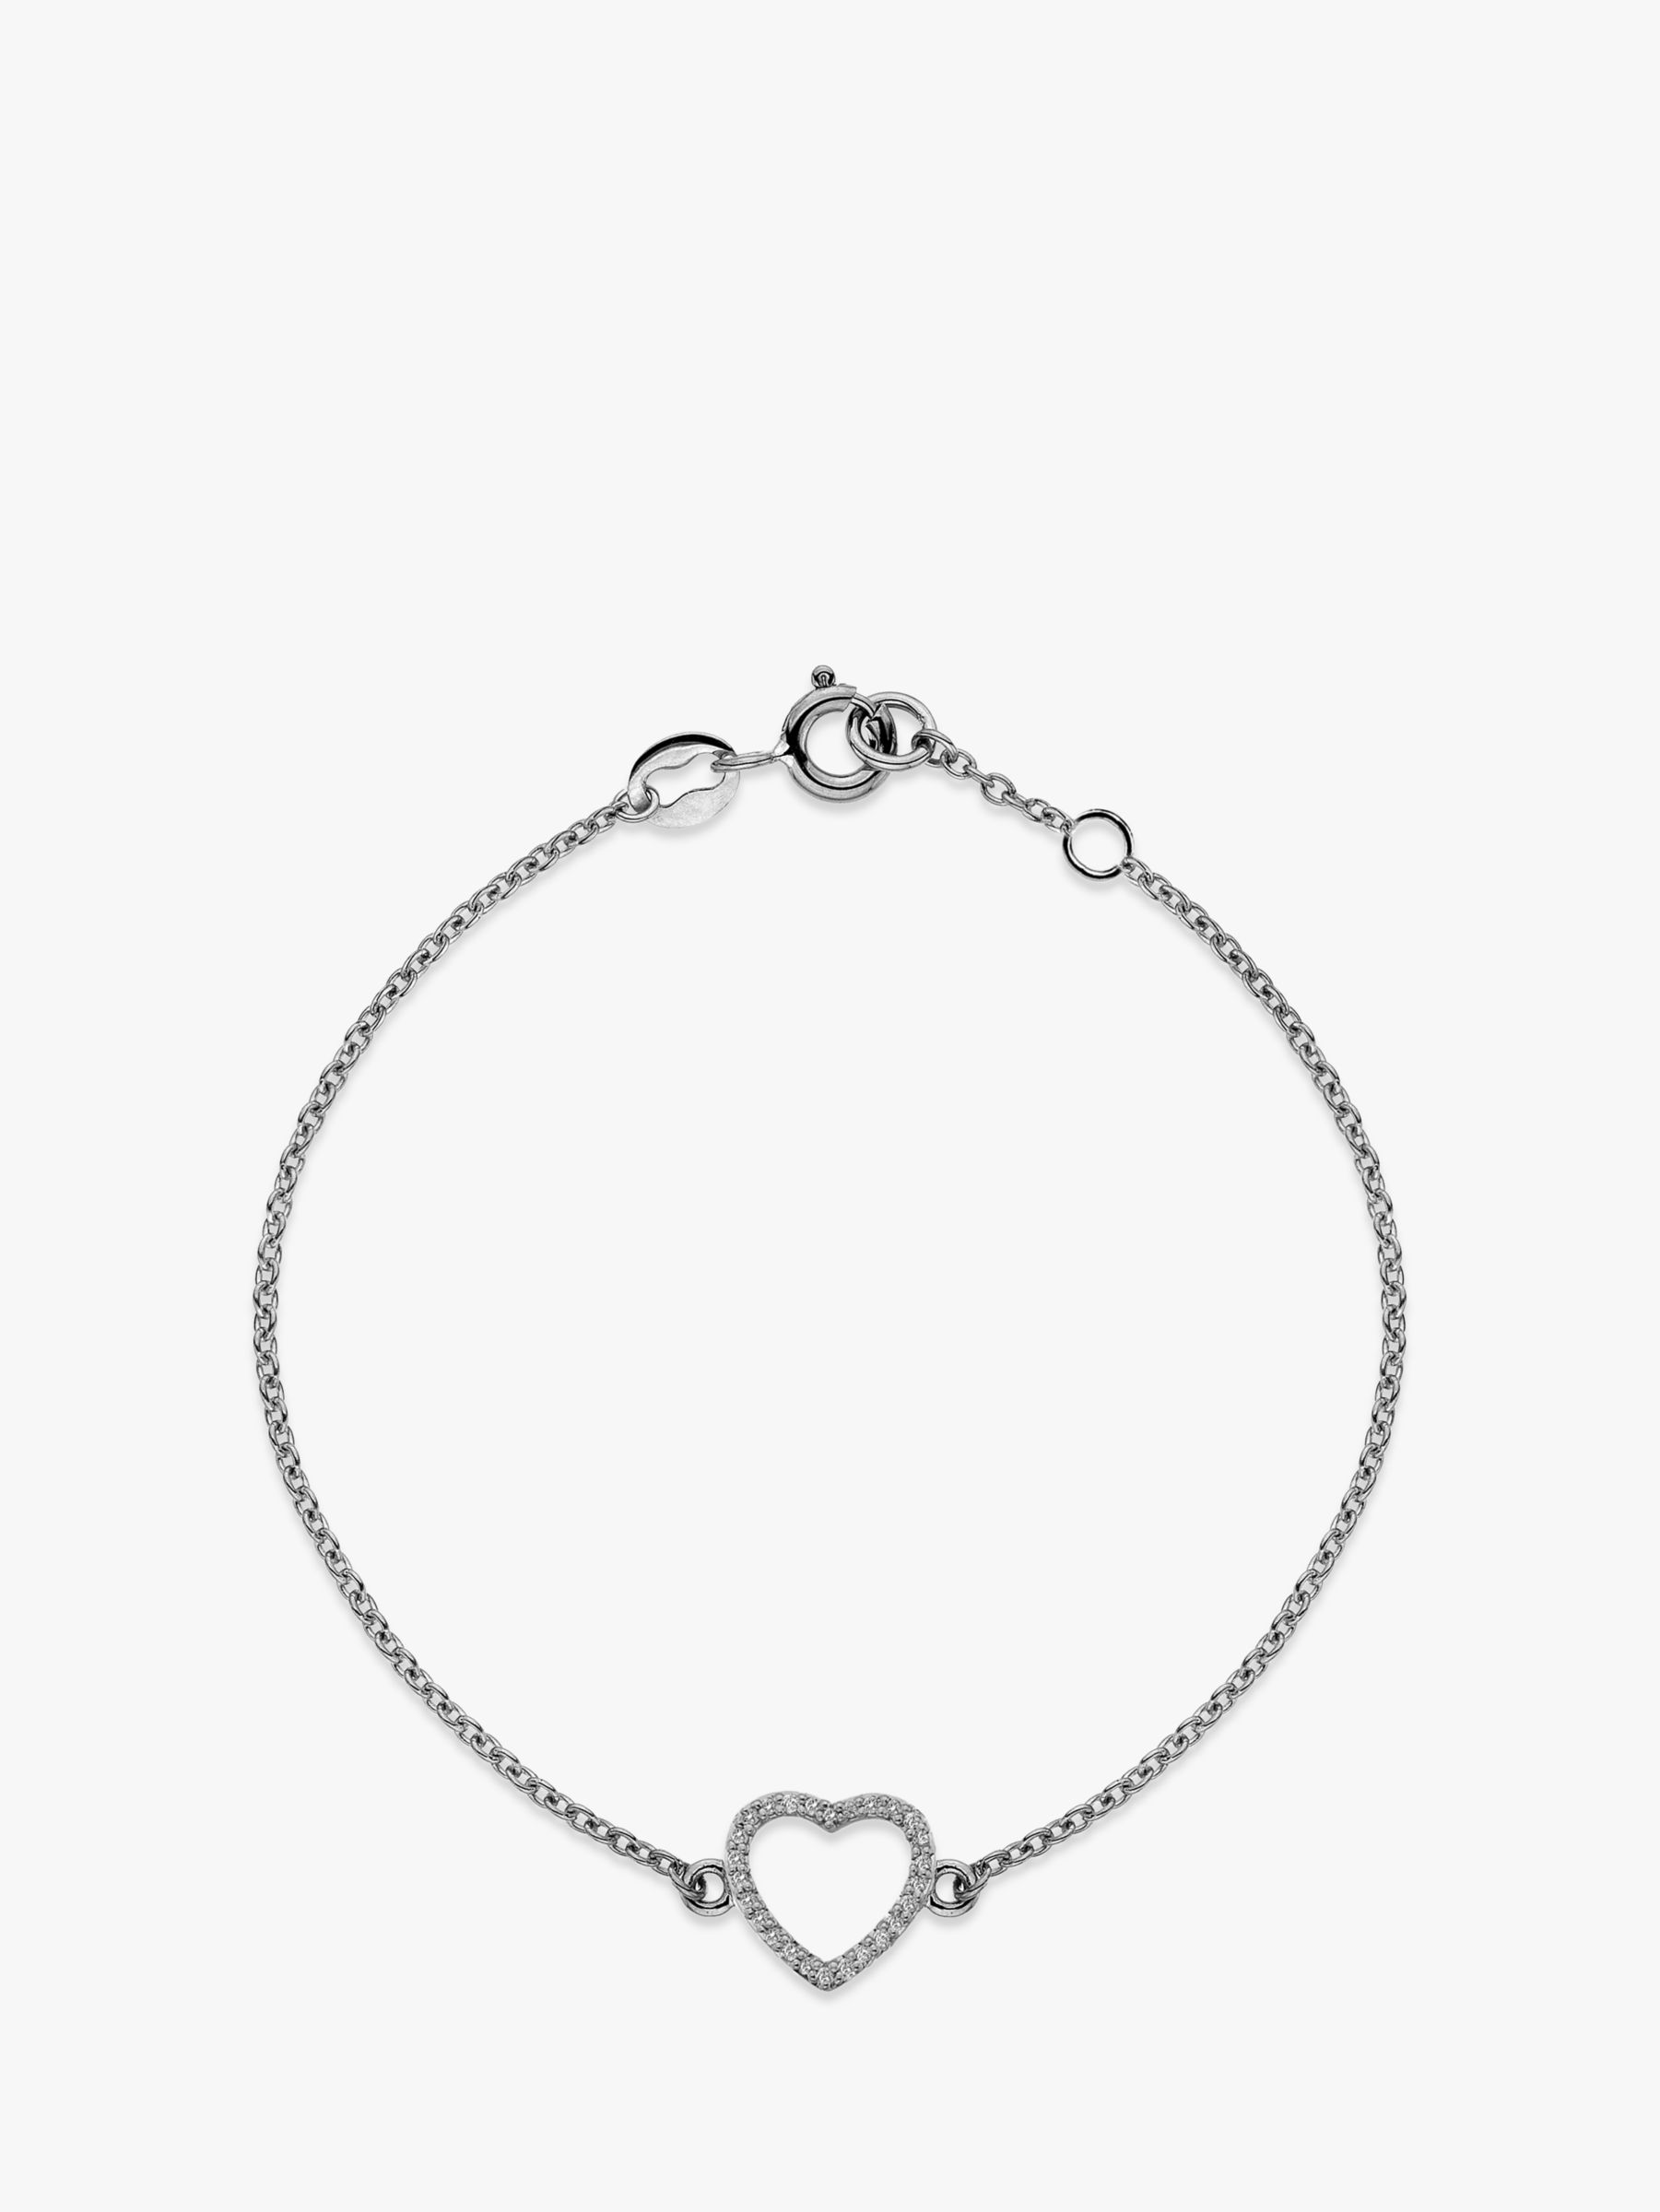 Hot Diamonds Hot Diamonds 9ct White Gold Ripple Heart Chain Bracelet